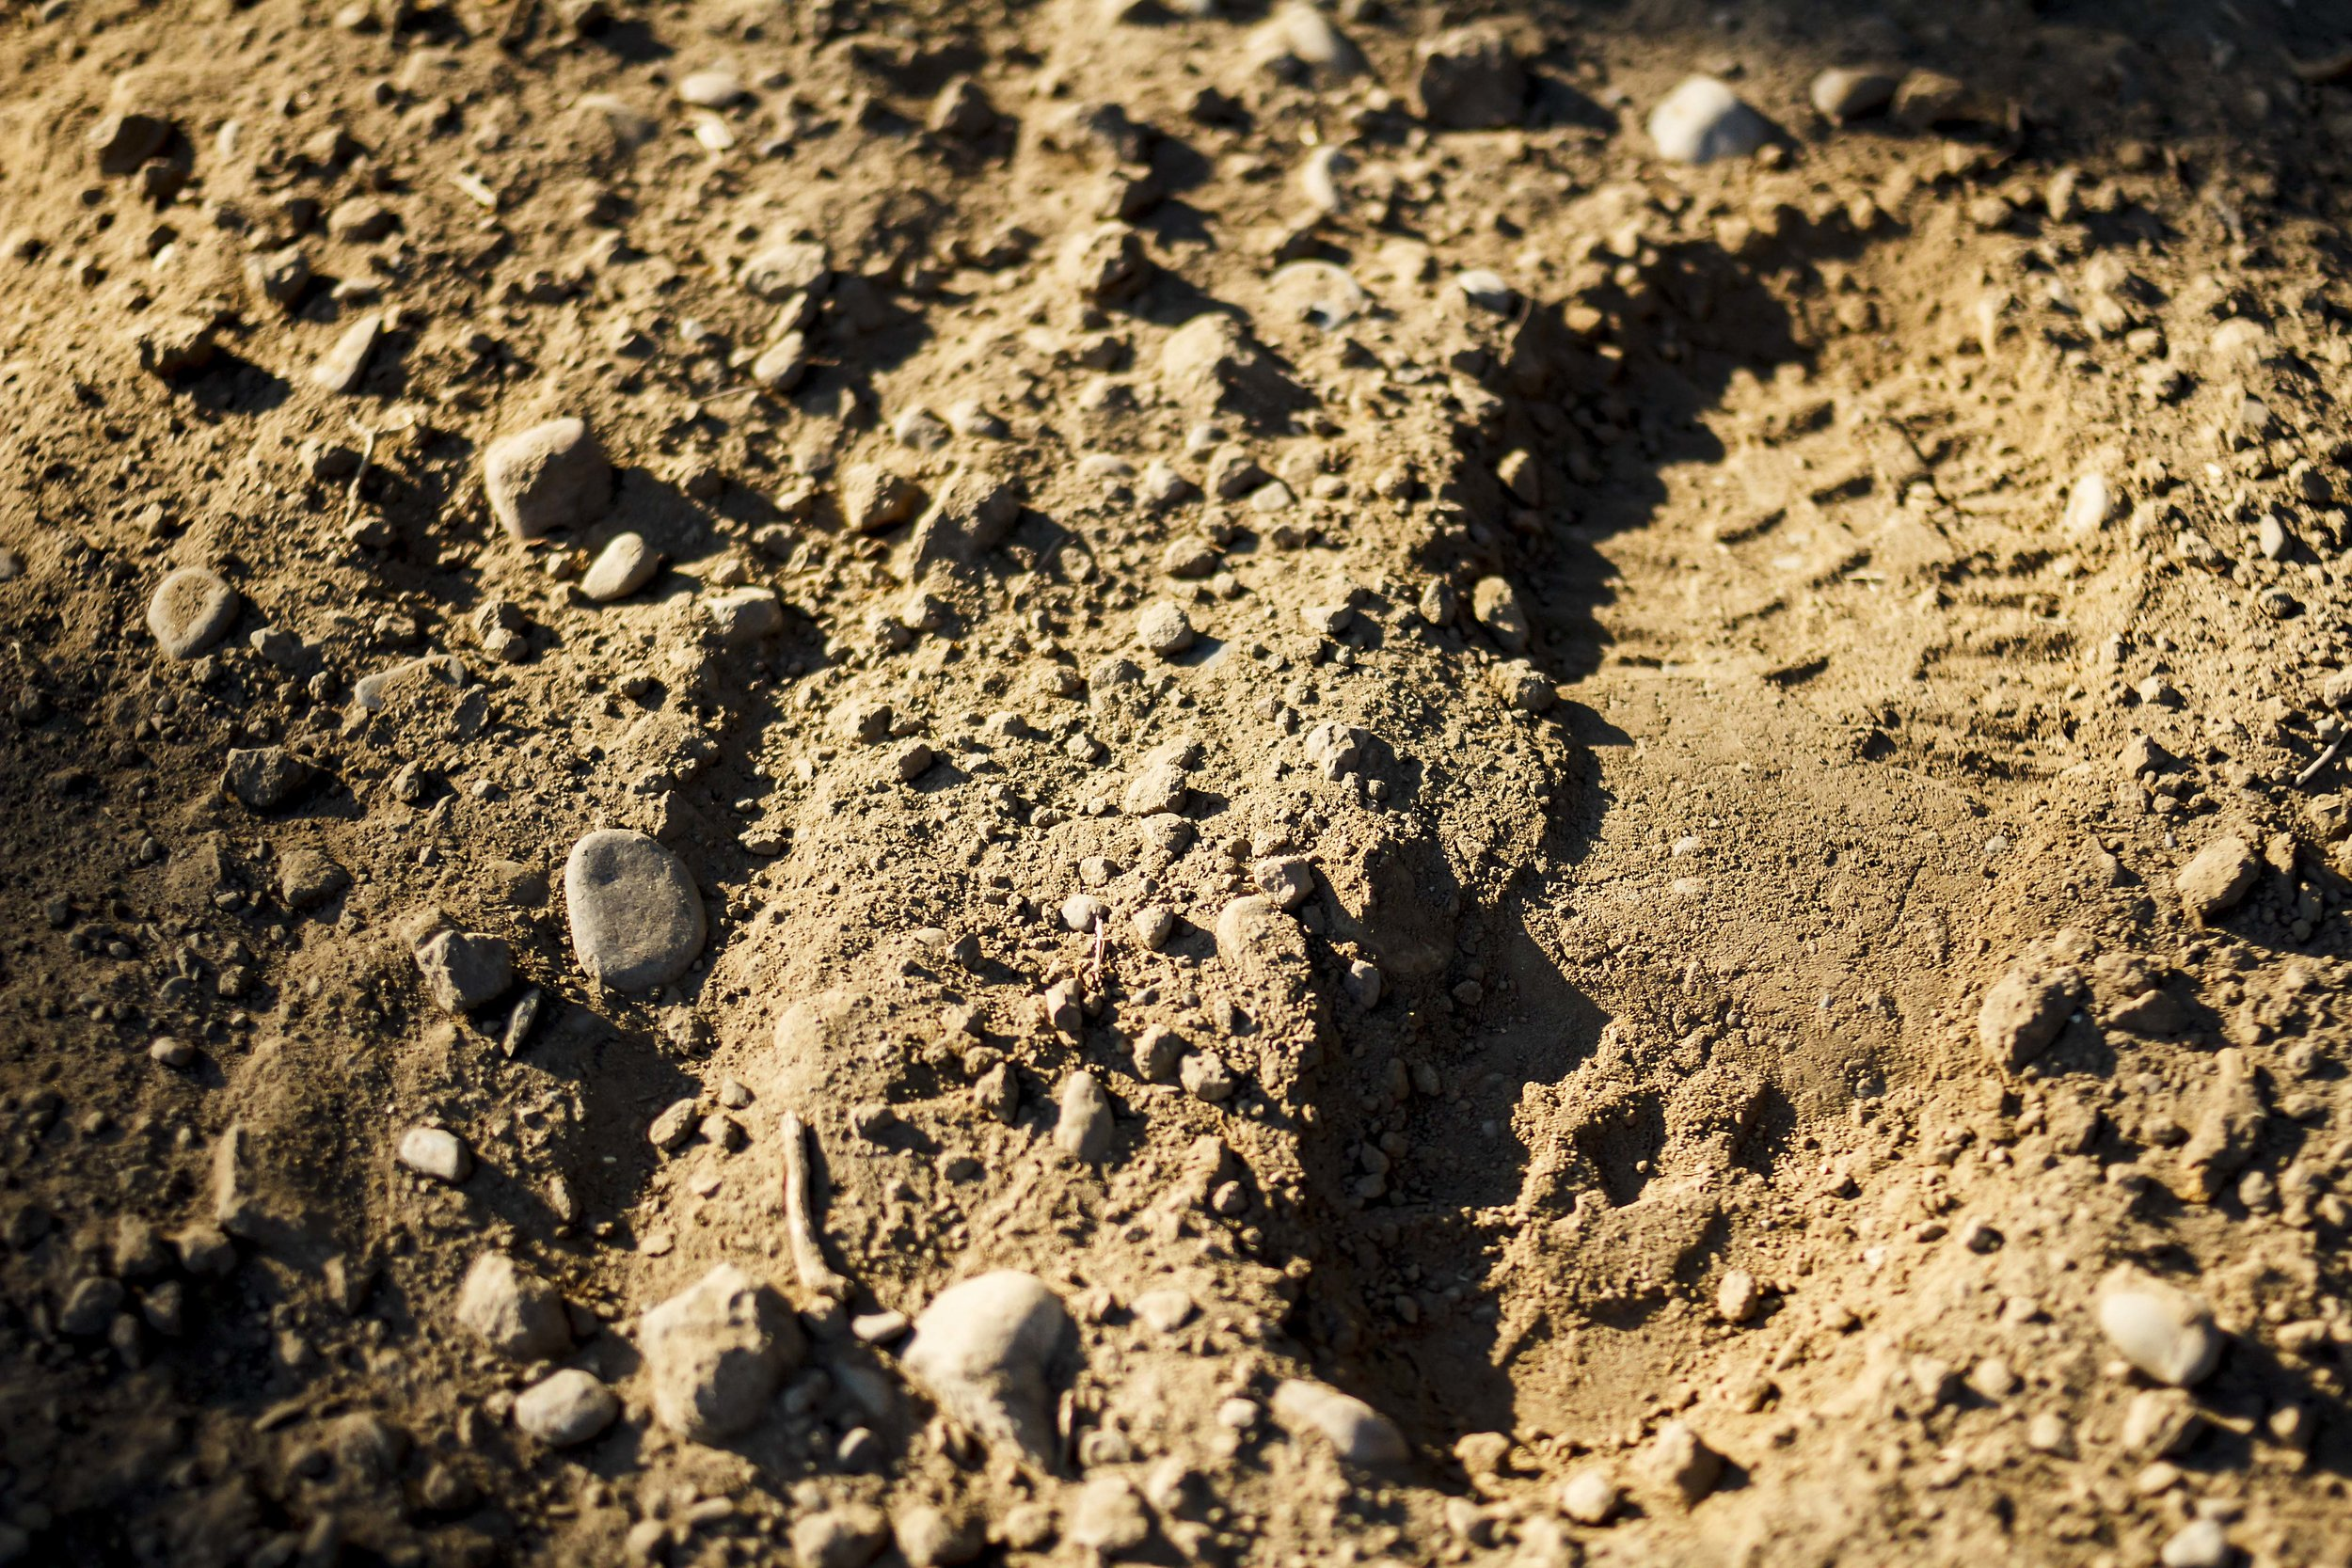 Footprint Select Botanicals Group Yakima Hop Farmers